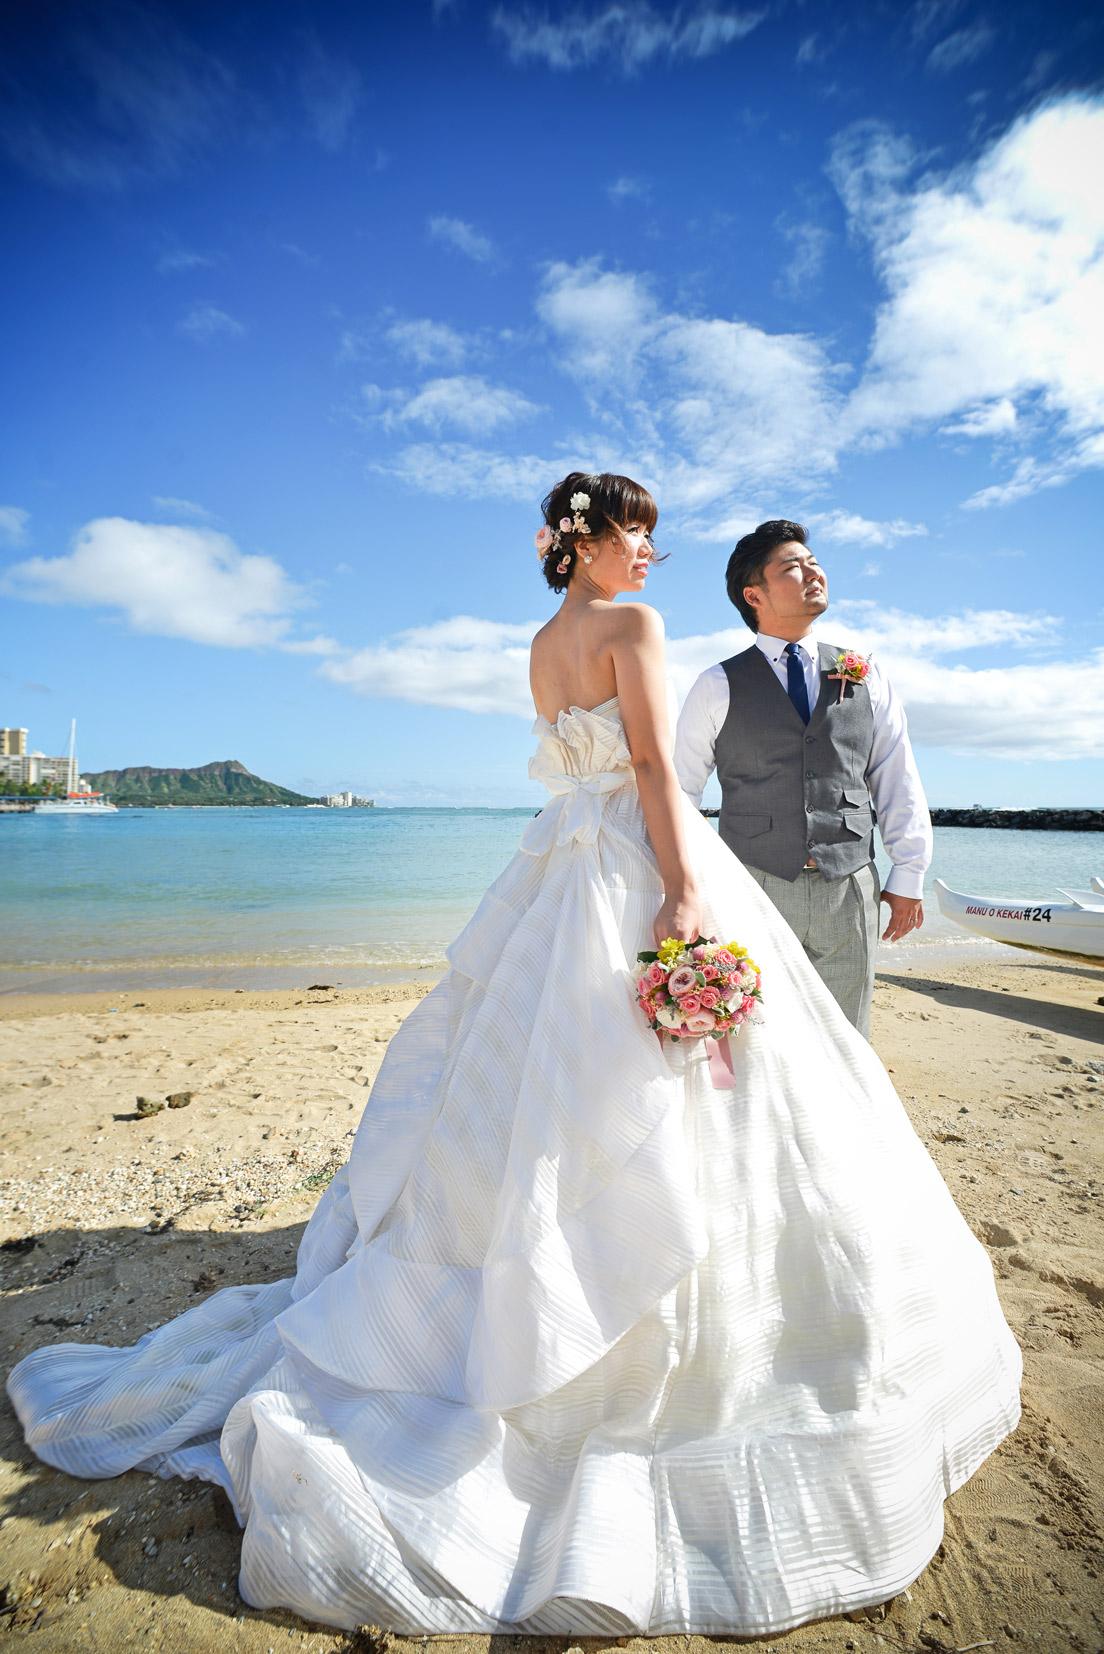 waikiki-beach-wedding-and-downtown-honolulu-hawaii-theater-stephen-ludwig-photography008.jpg